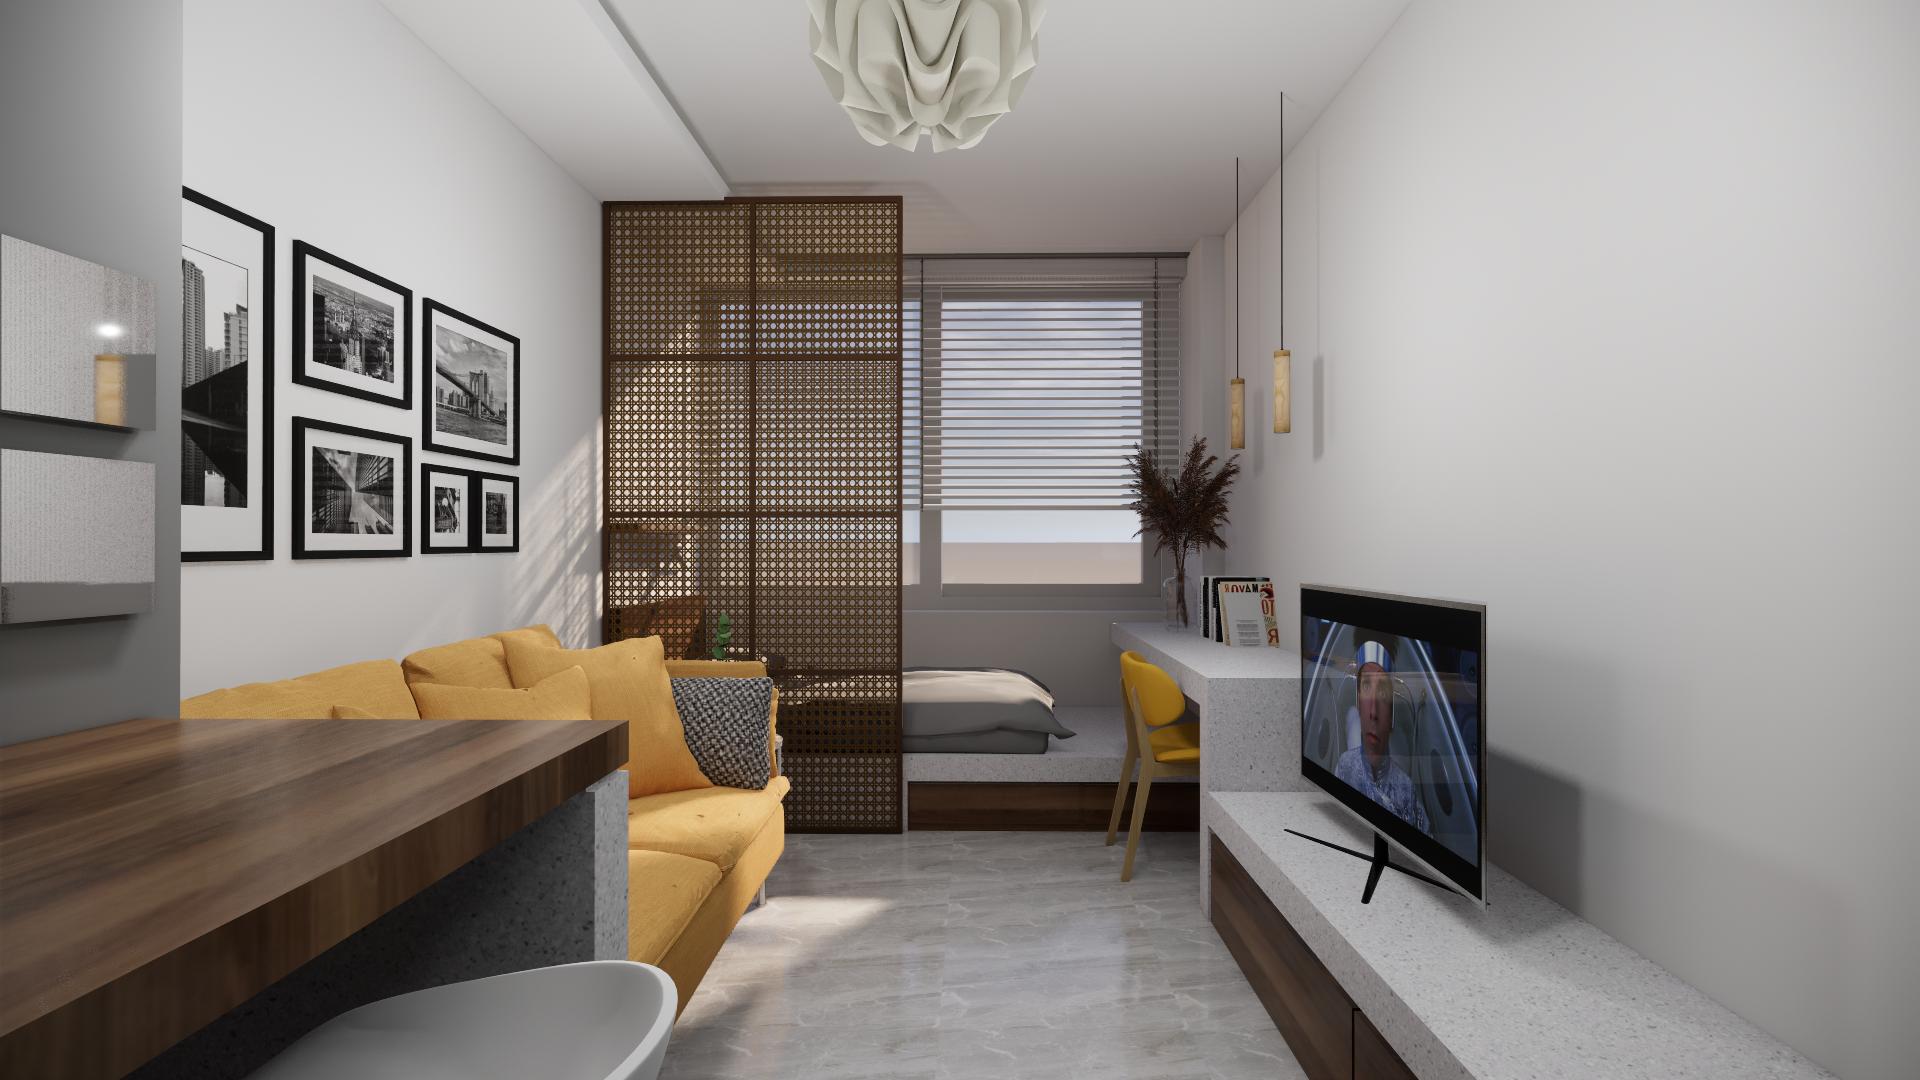 Studio/loft για επένδυση!